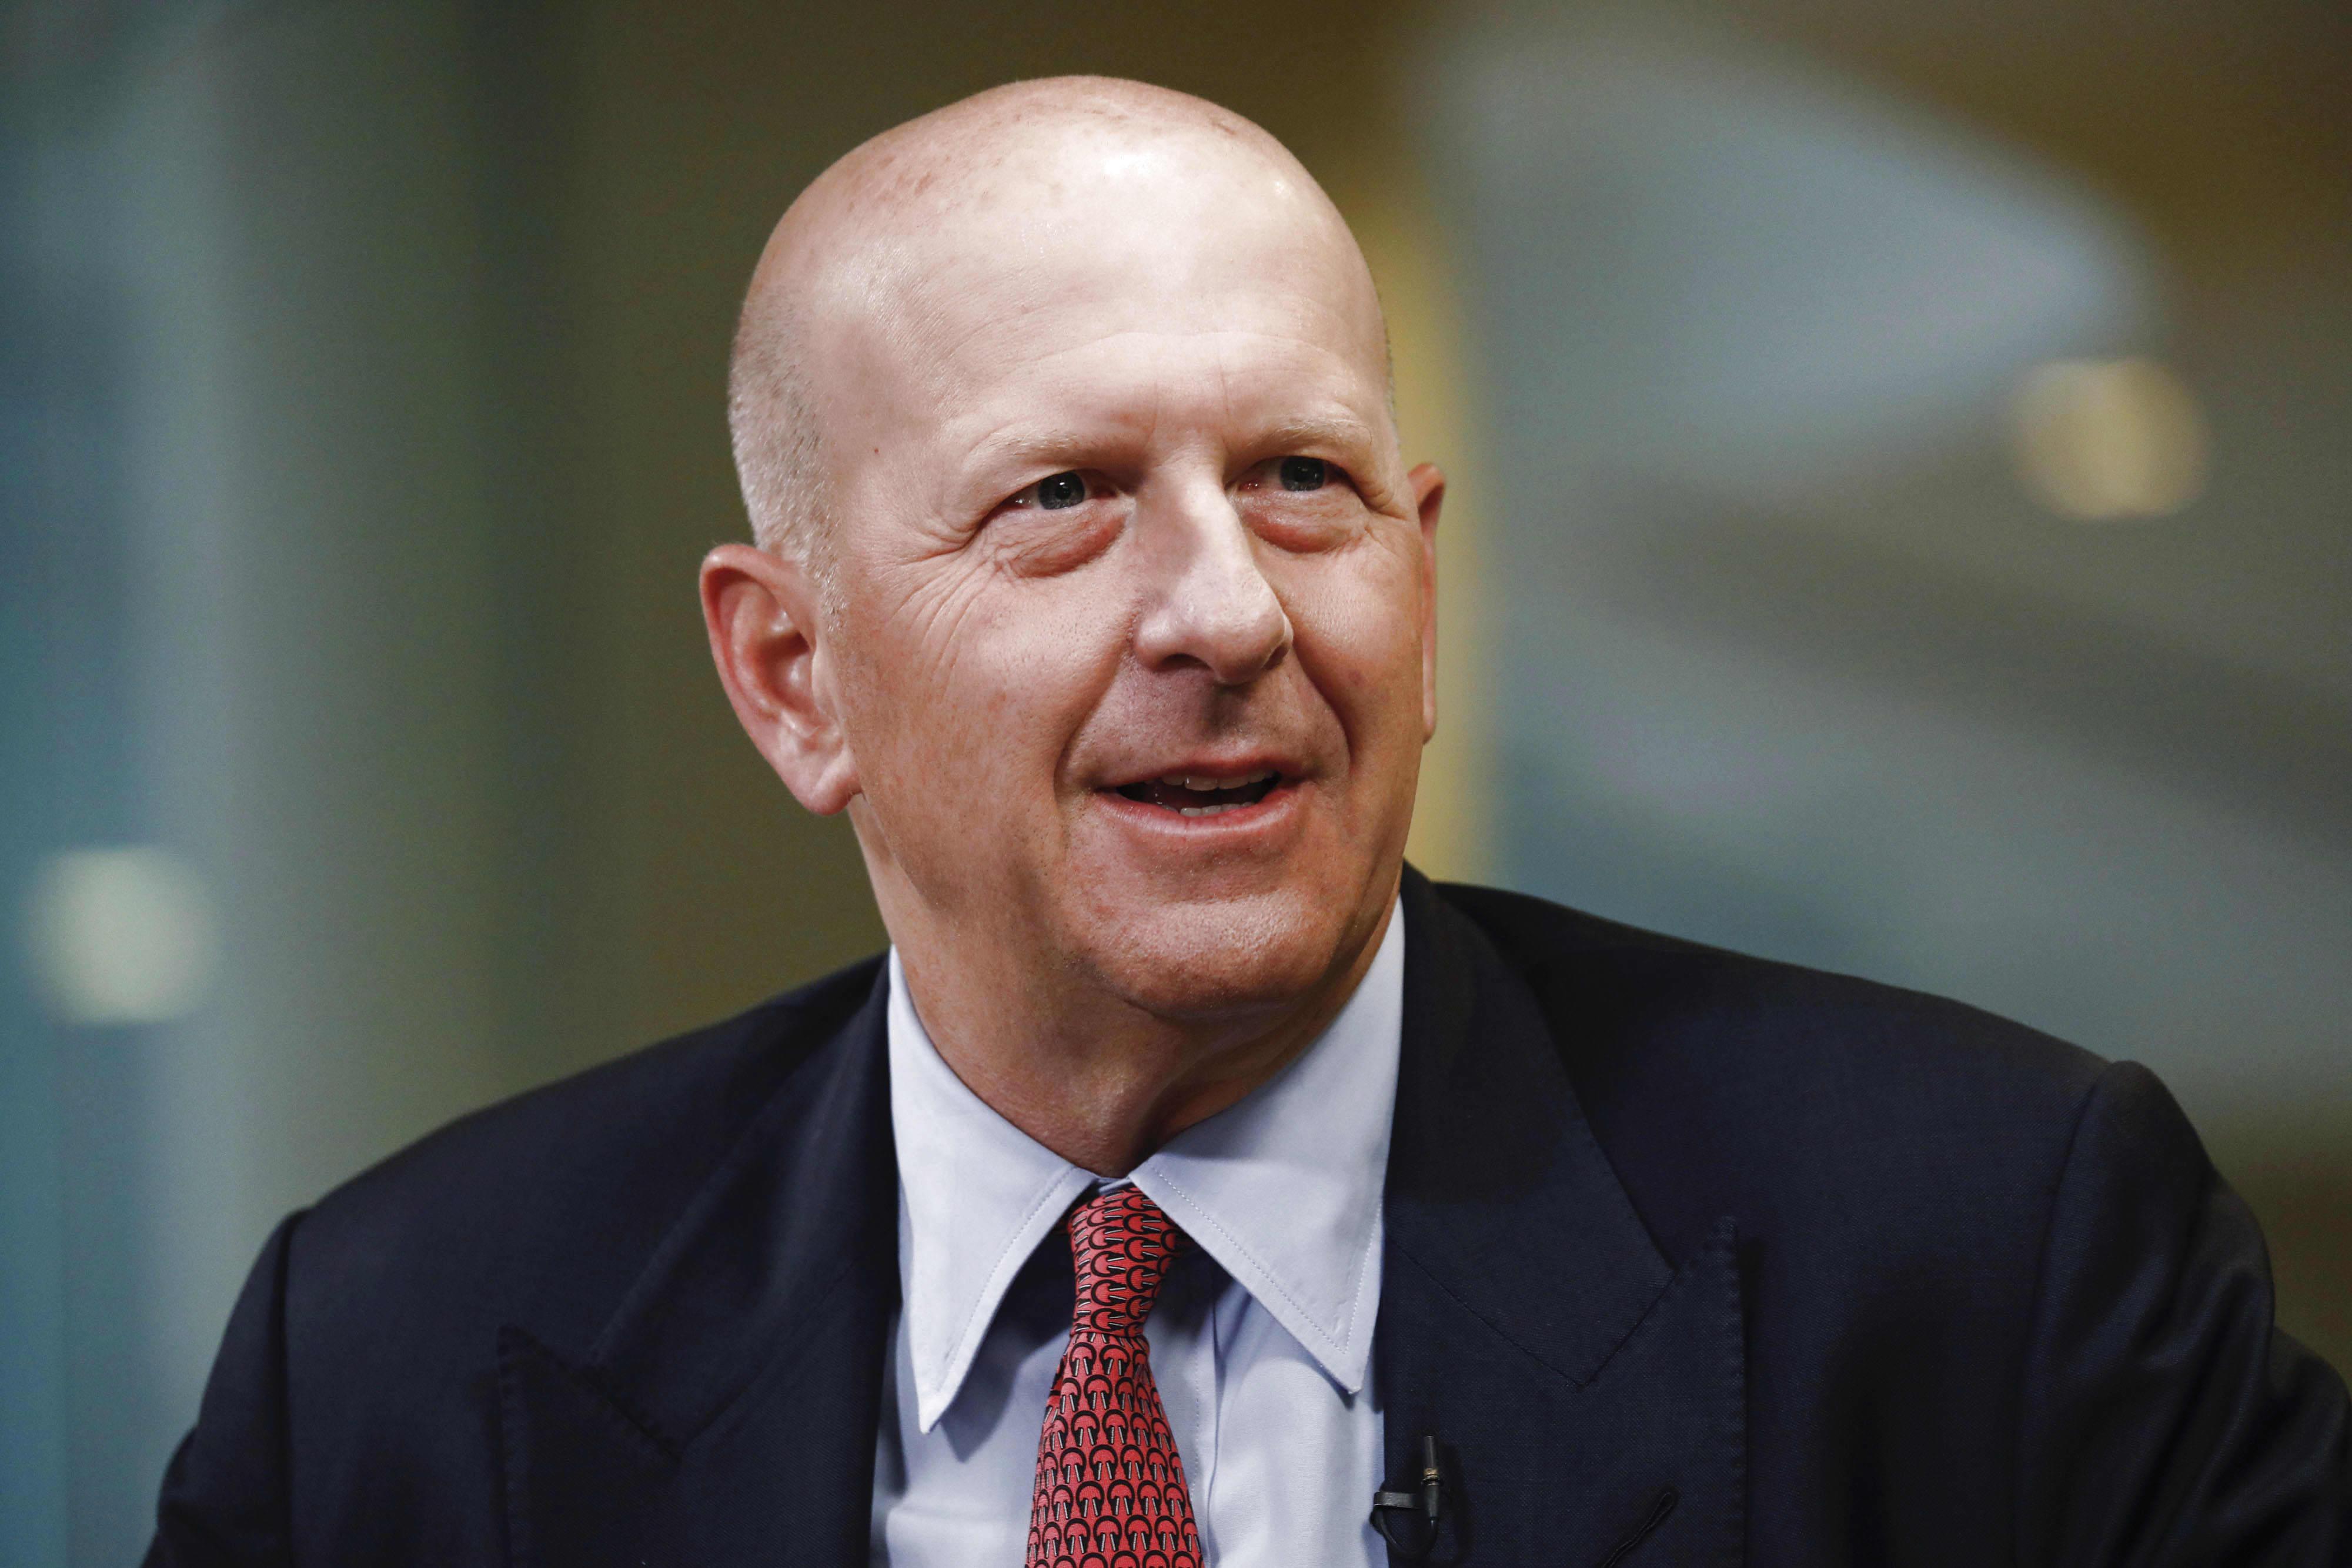 Goldman CEO David Solomon says China's crackdown on tech companies will delay many U.S. listings